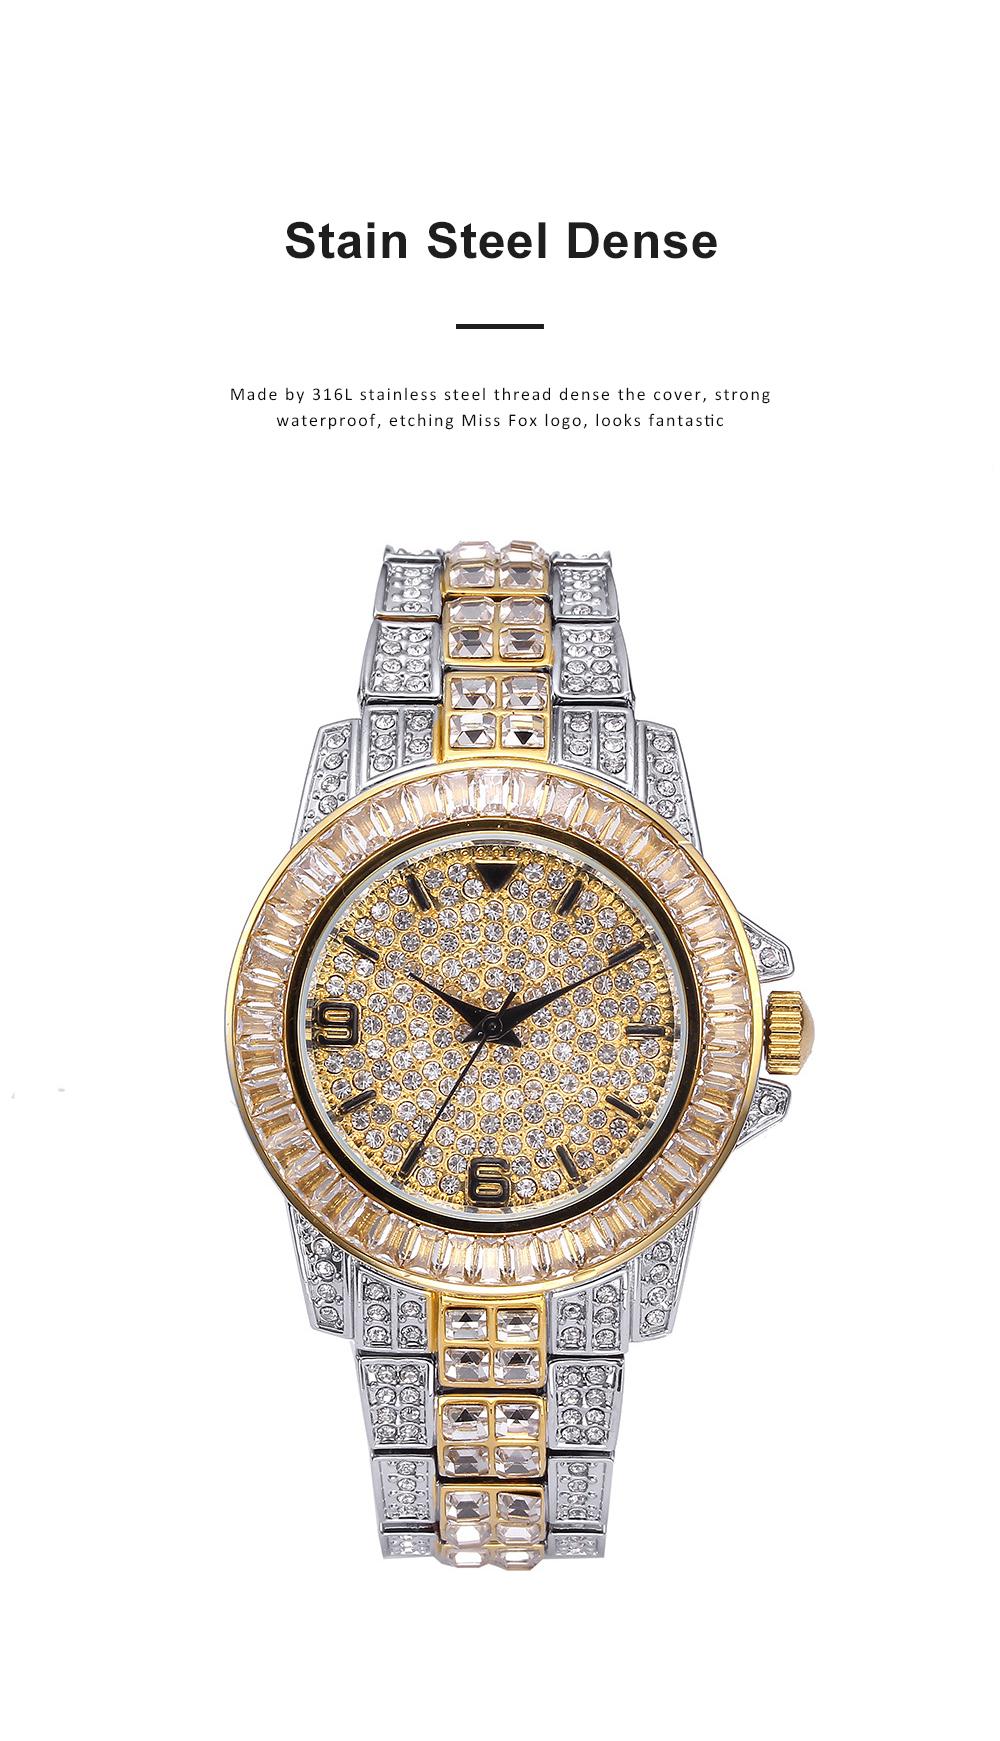 New Men Fashion Exquisite Waterproof Diamond Date Quartz Watch Gold Stainless Steel Business Luxury Mens Watches 1